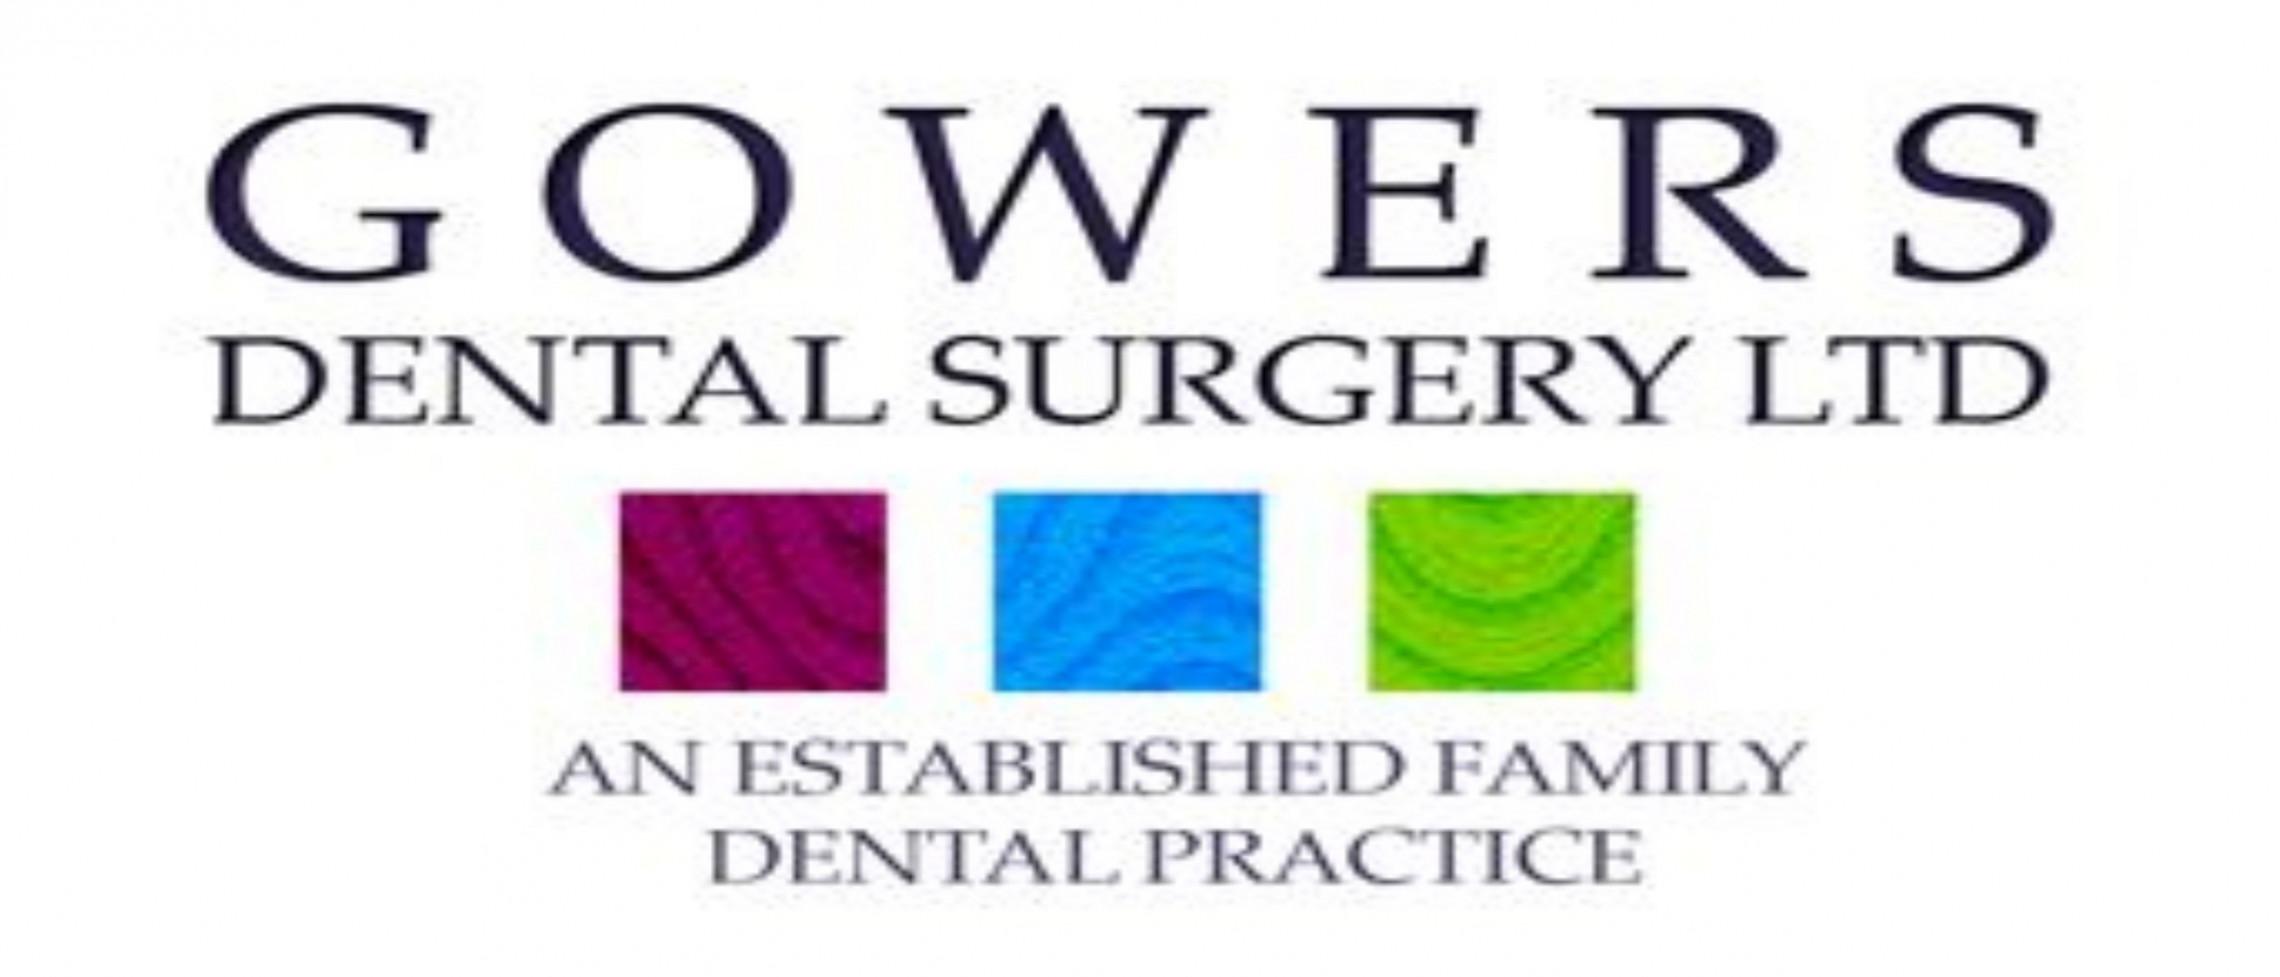 Gowers Dental Surgery Ltd